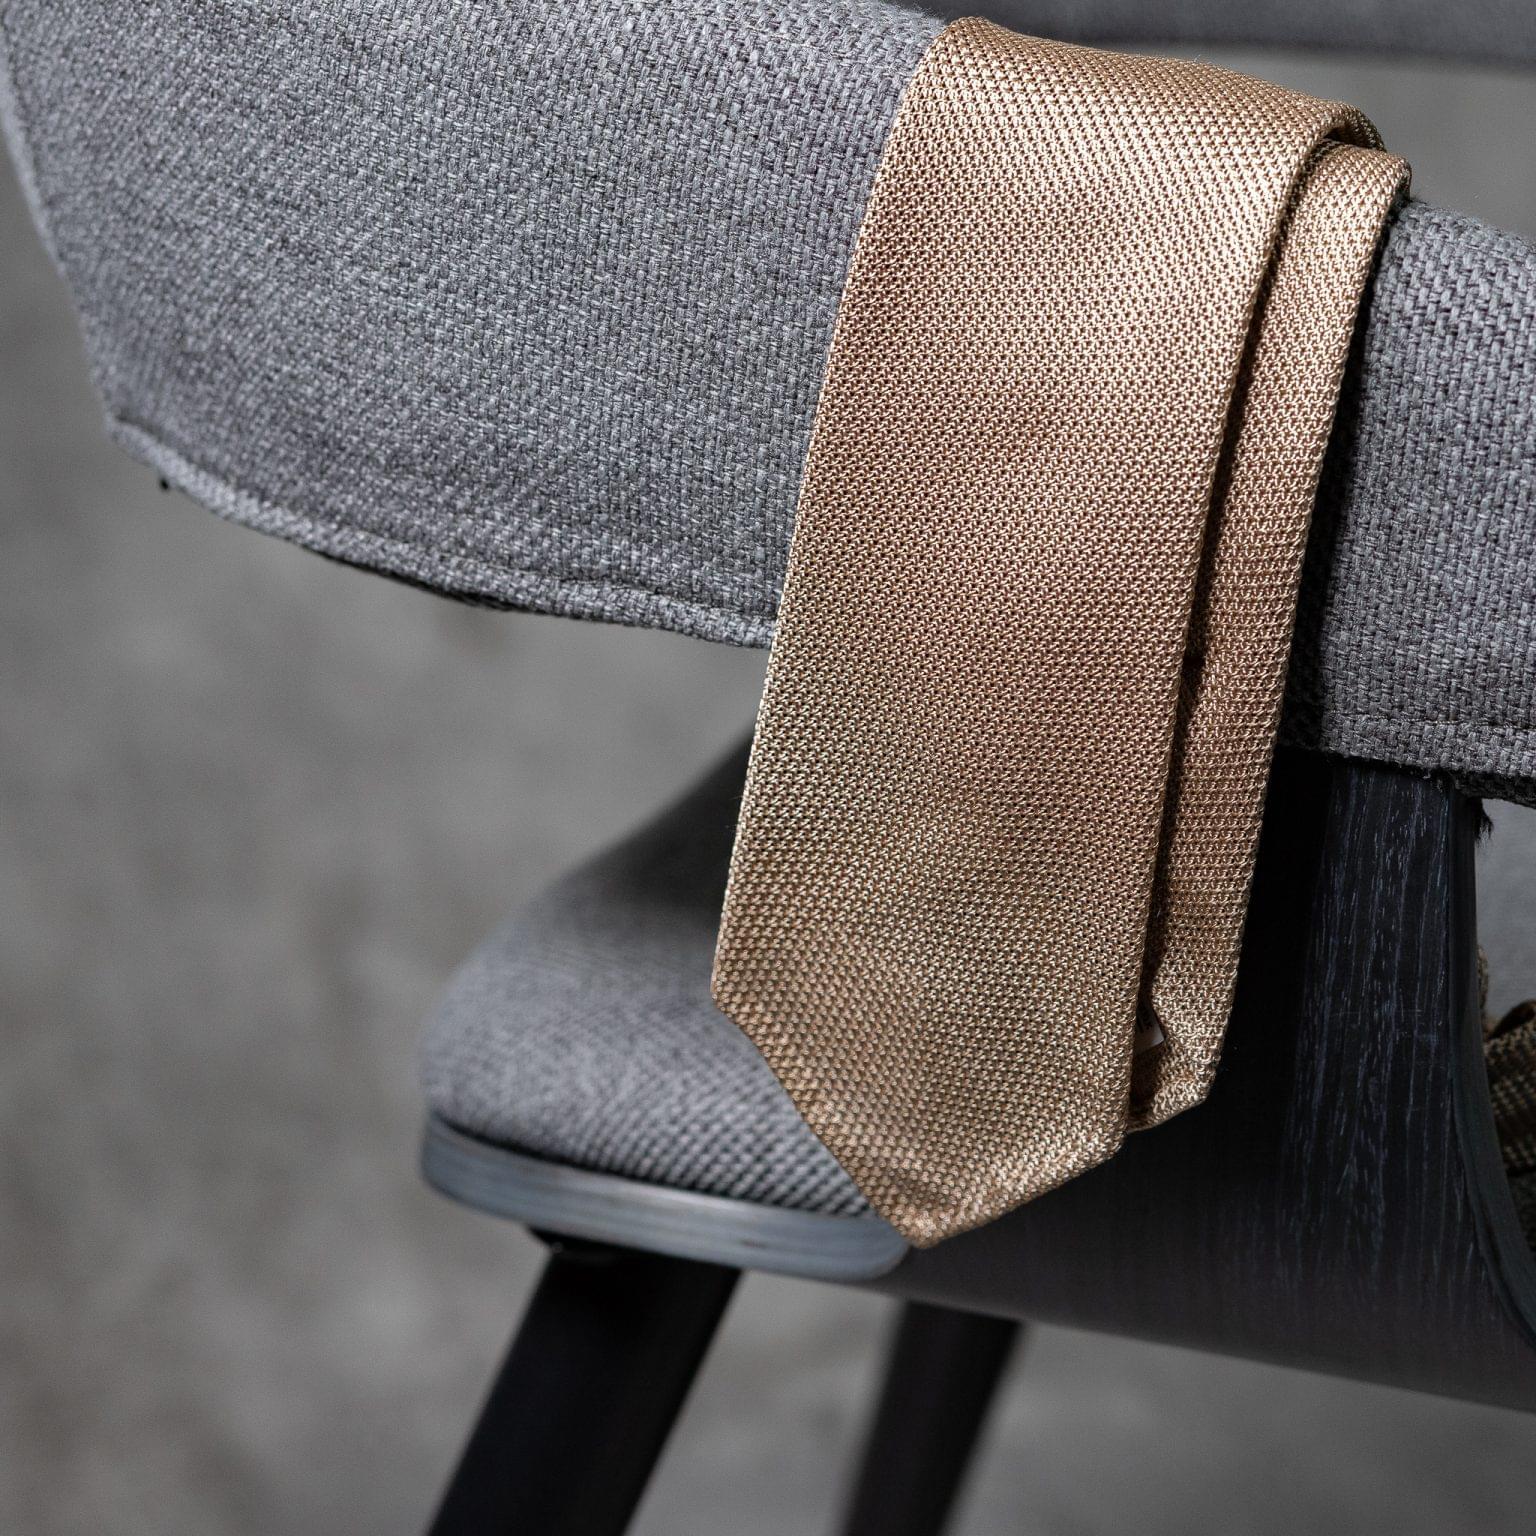 GRENADINE-0463-Tie-Initials-Corbata-Iniciales-The-Seelk-2